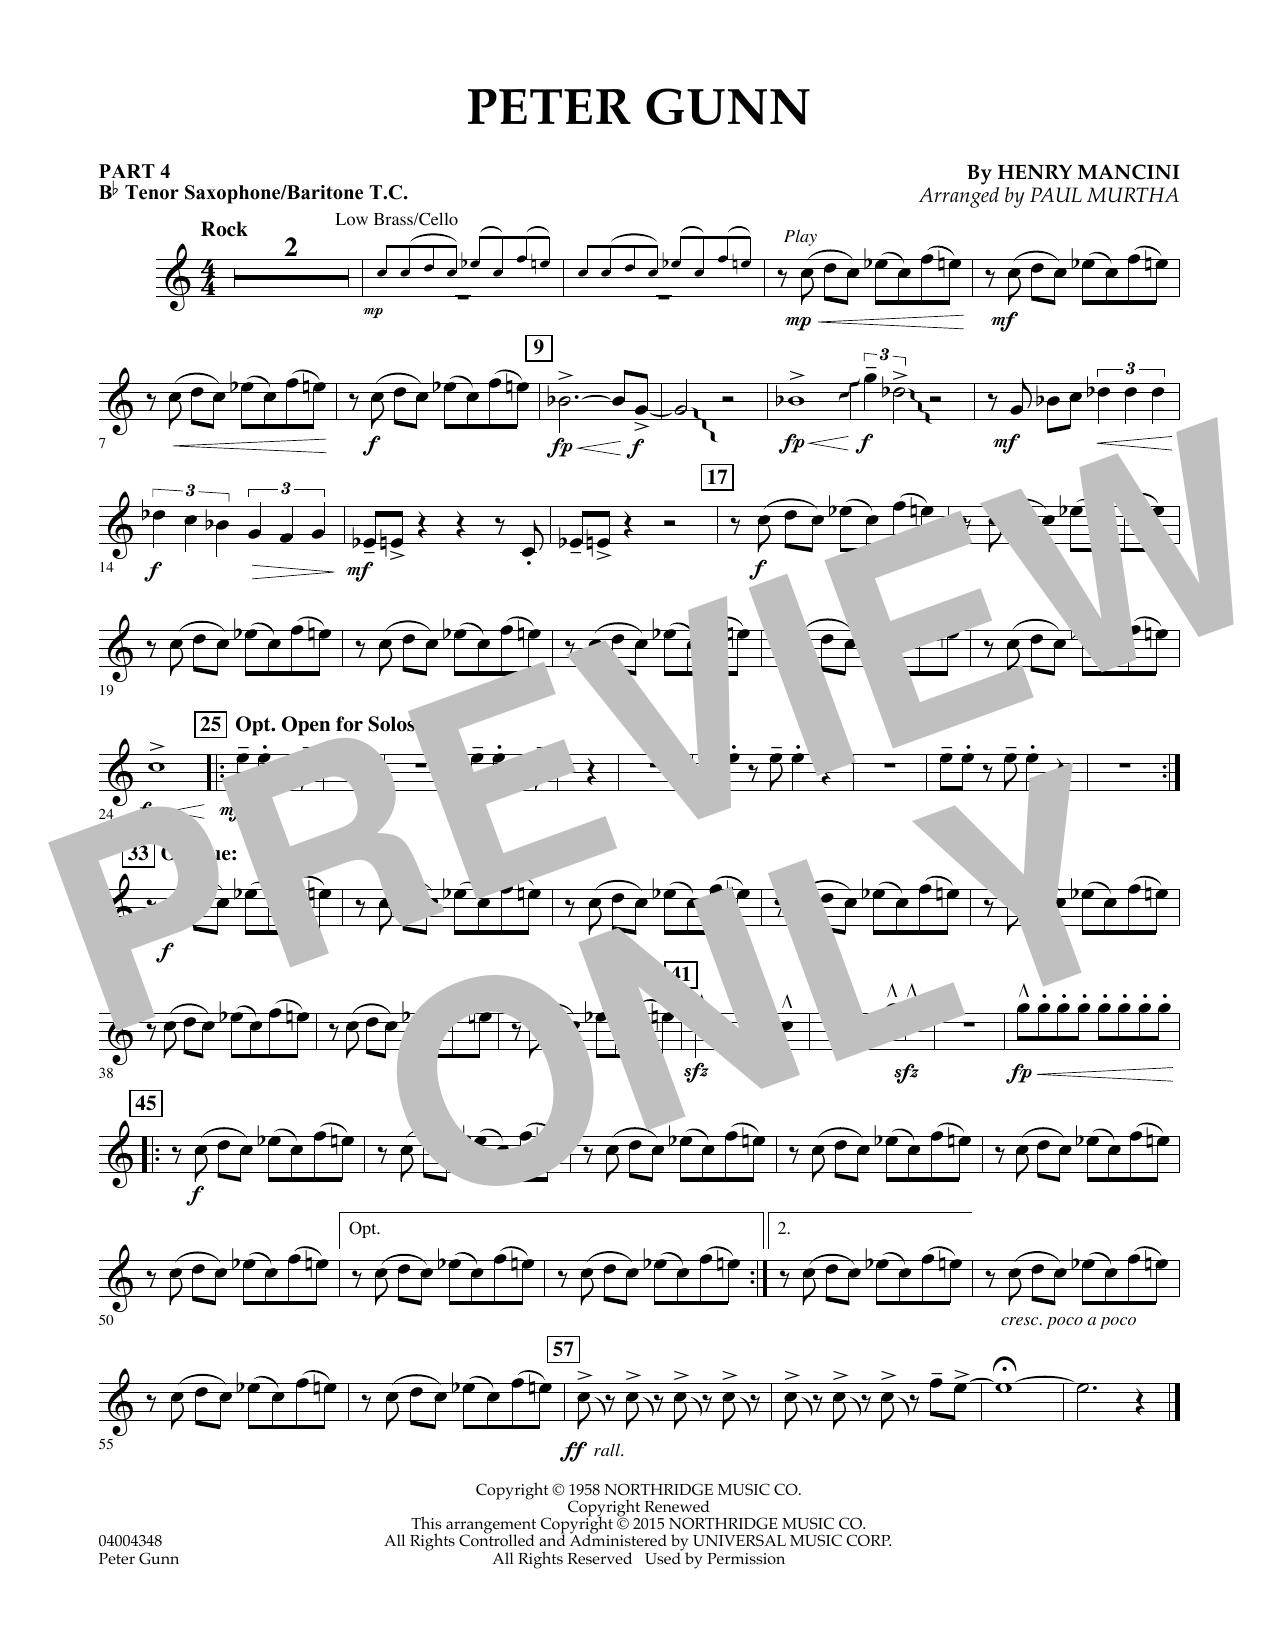 Peter Gunn - Pt.4 - Bb Tenor Sax/Bar. T.C. (Flex-Band)